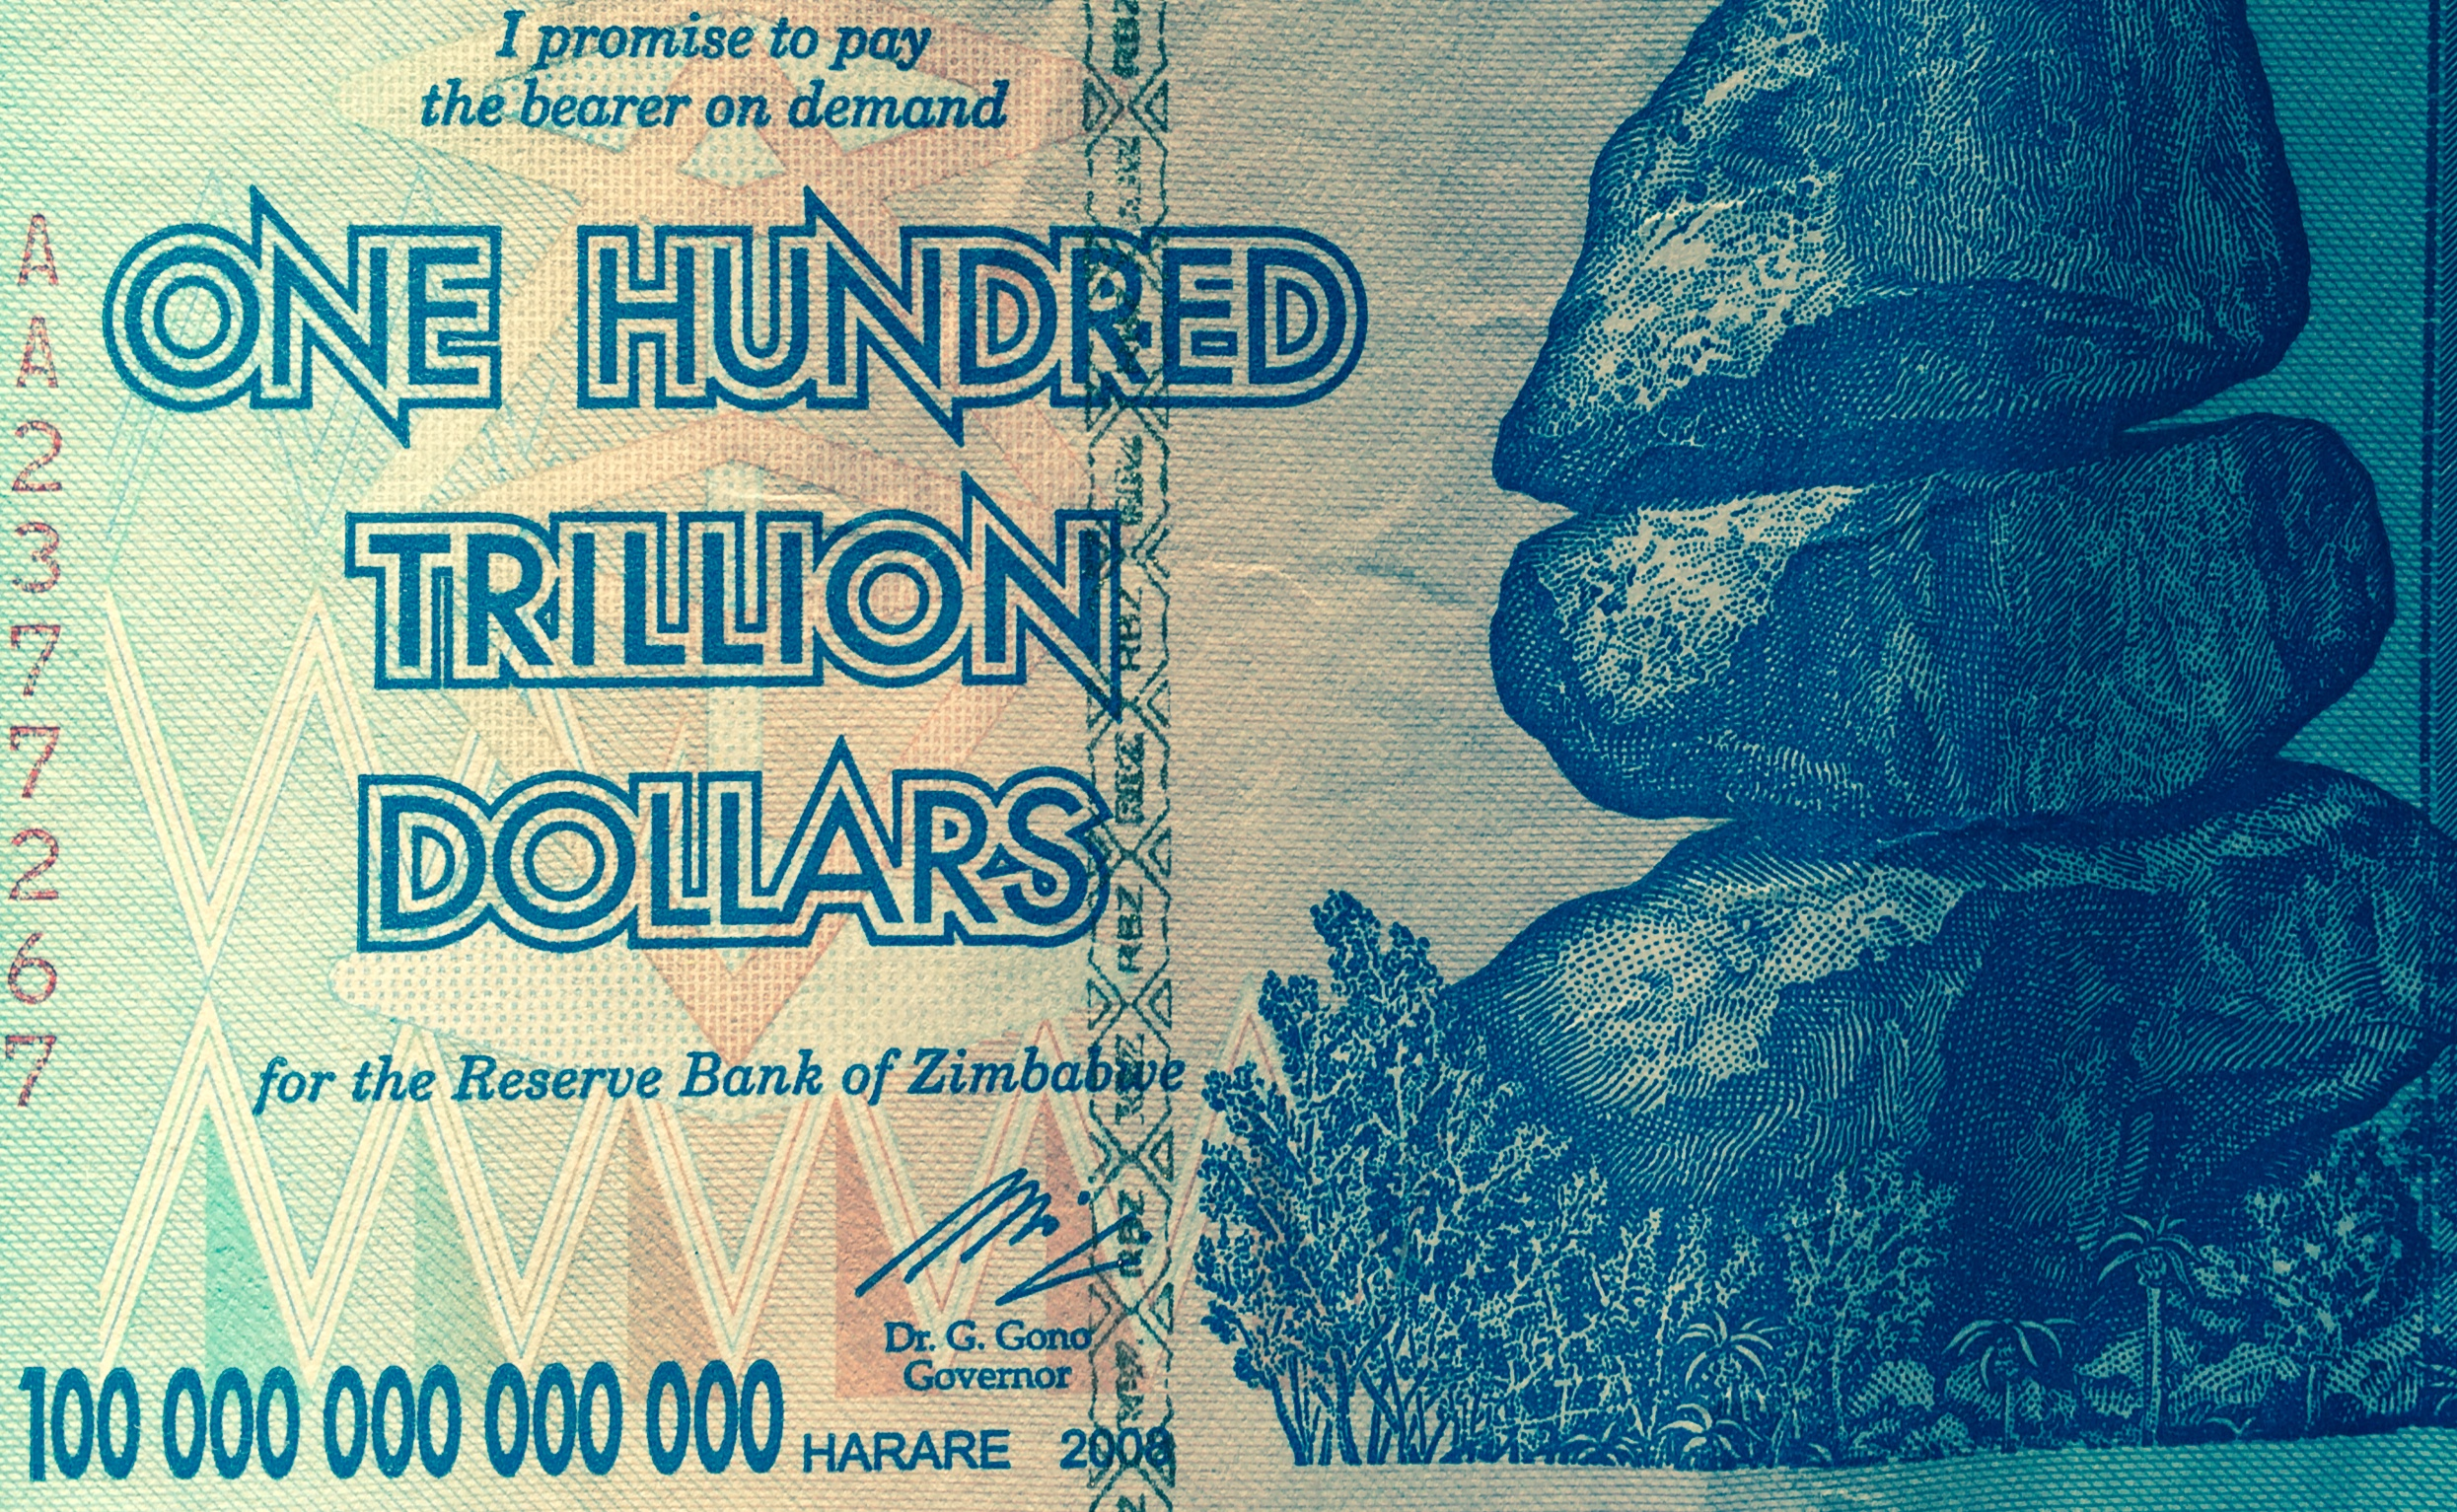 OneHundredTrillionDollars